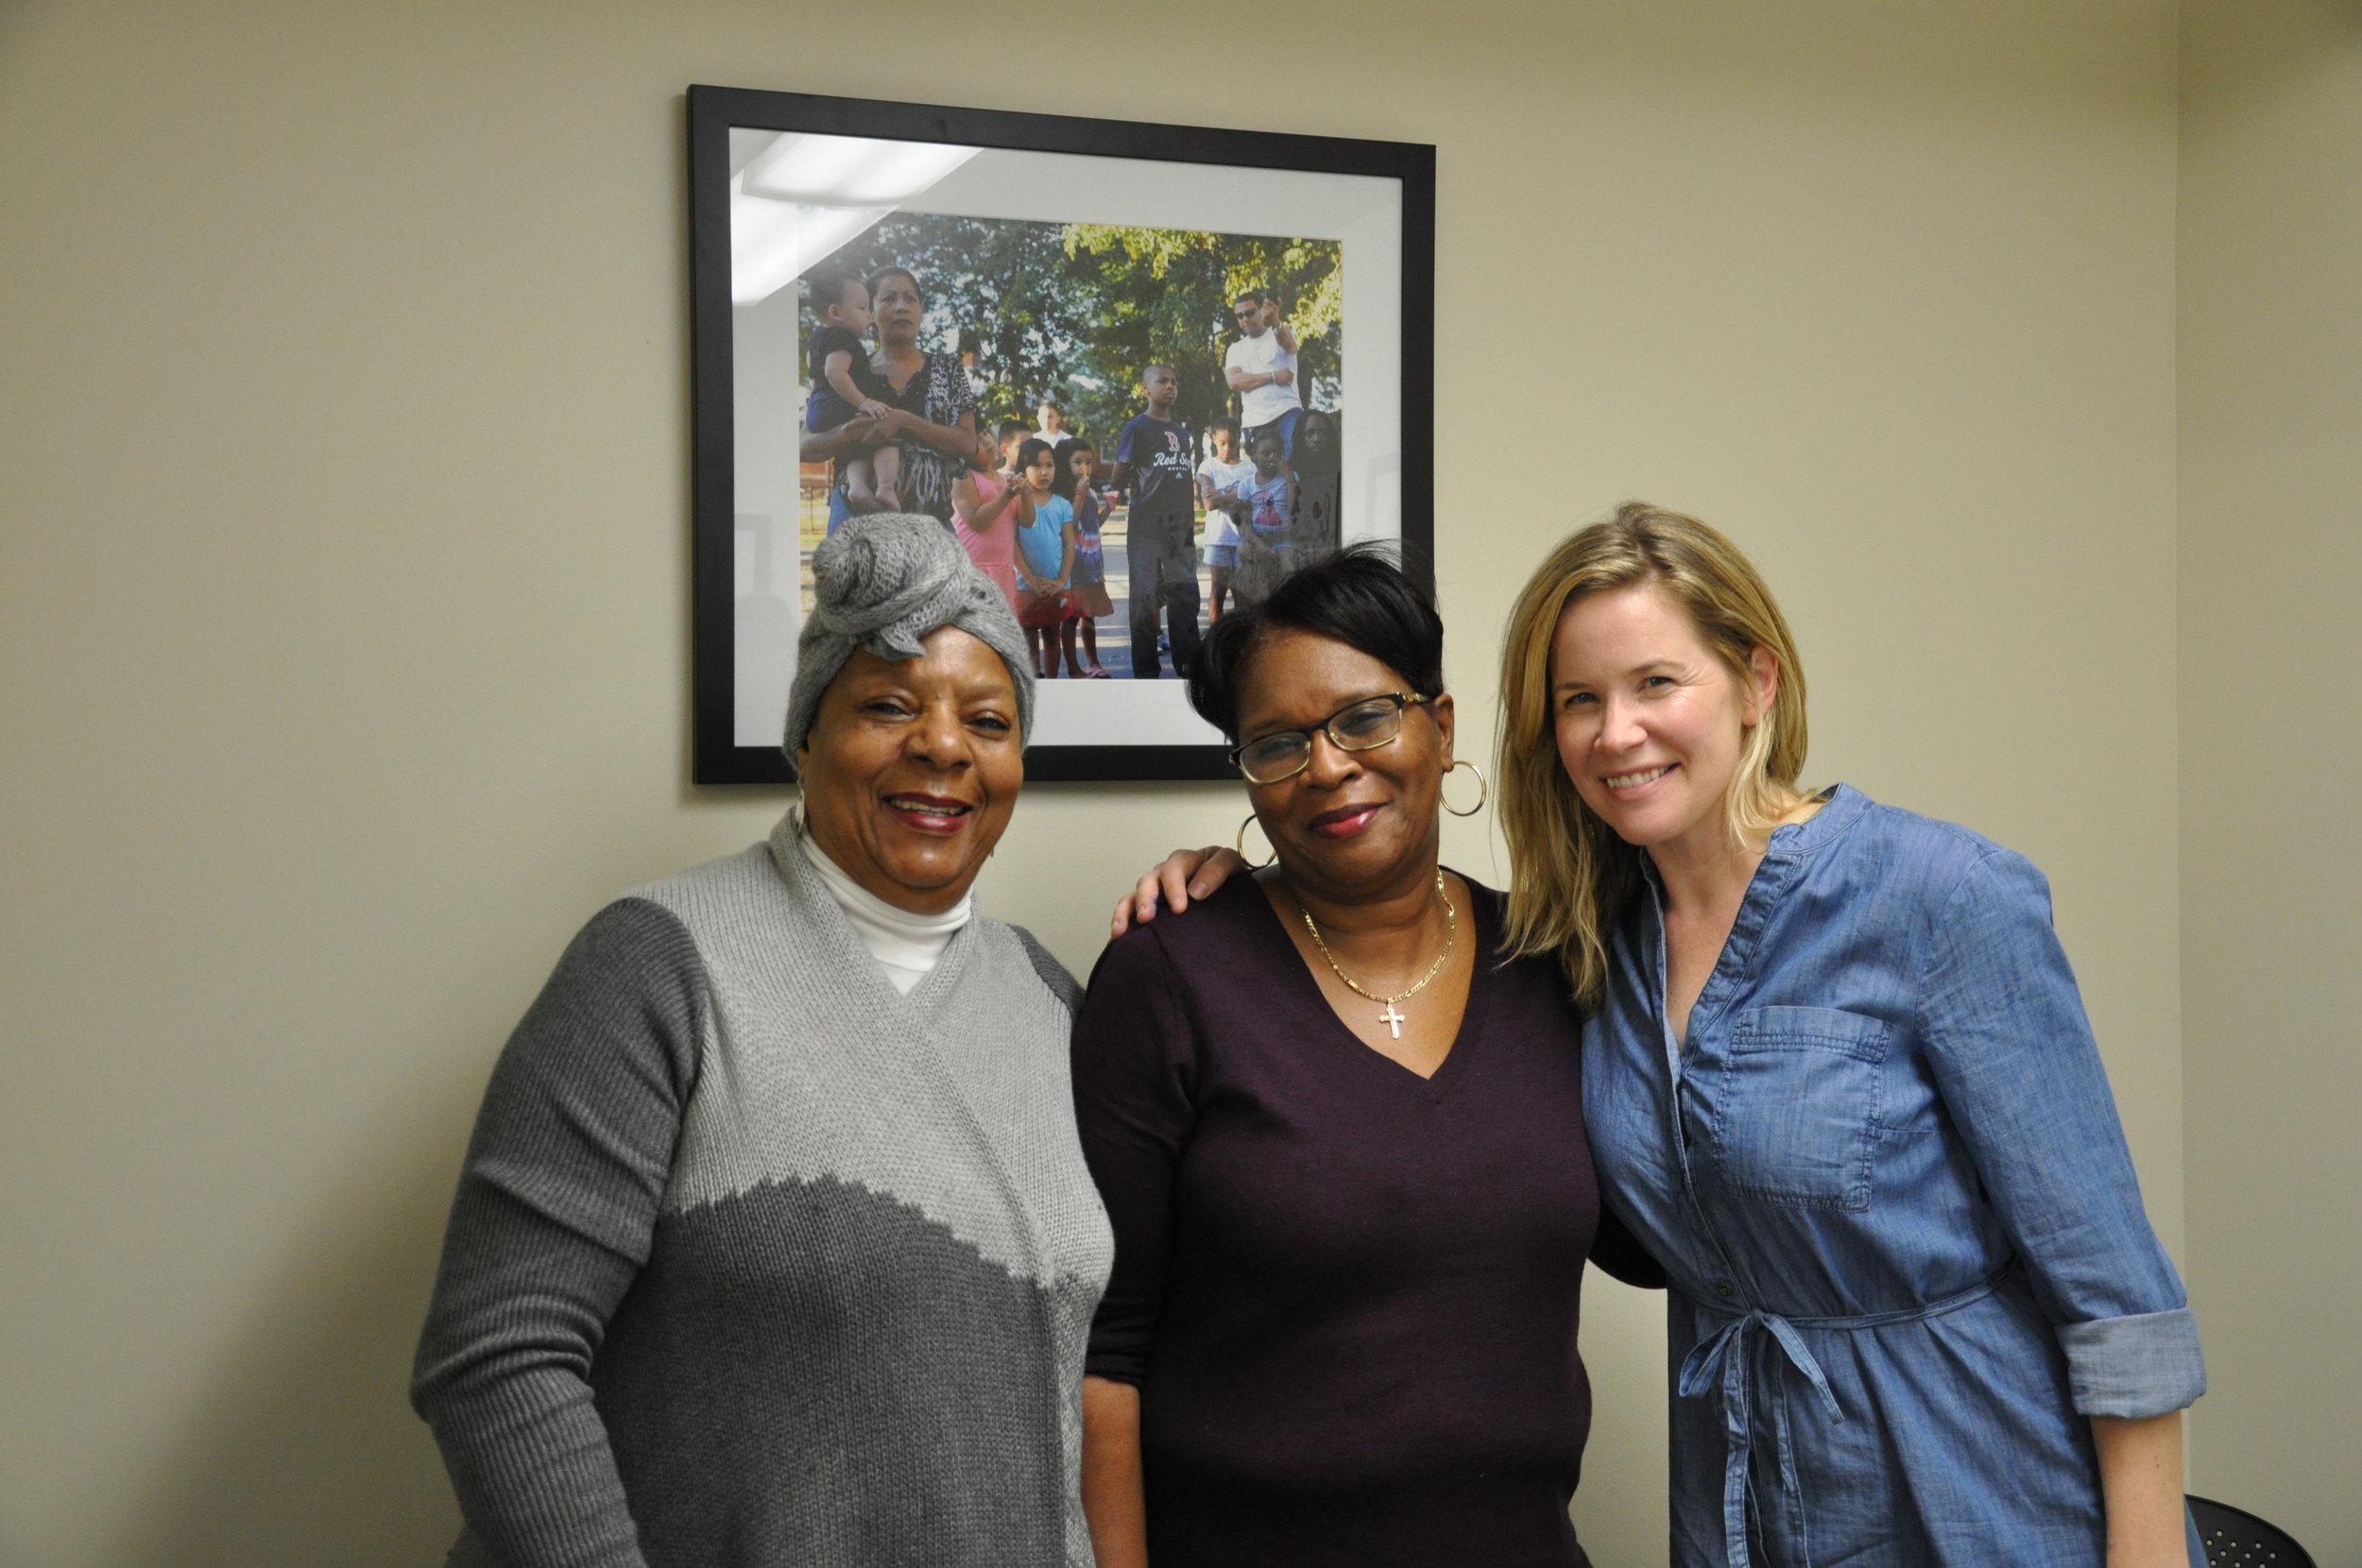 MJE Volunteer Lola Alexander, MJE Founder Monalisa Smith and writer Andrea Cale at MJE's headquarters in Roxbury, Mass.